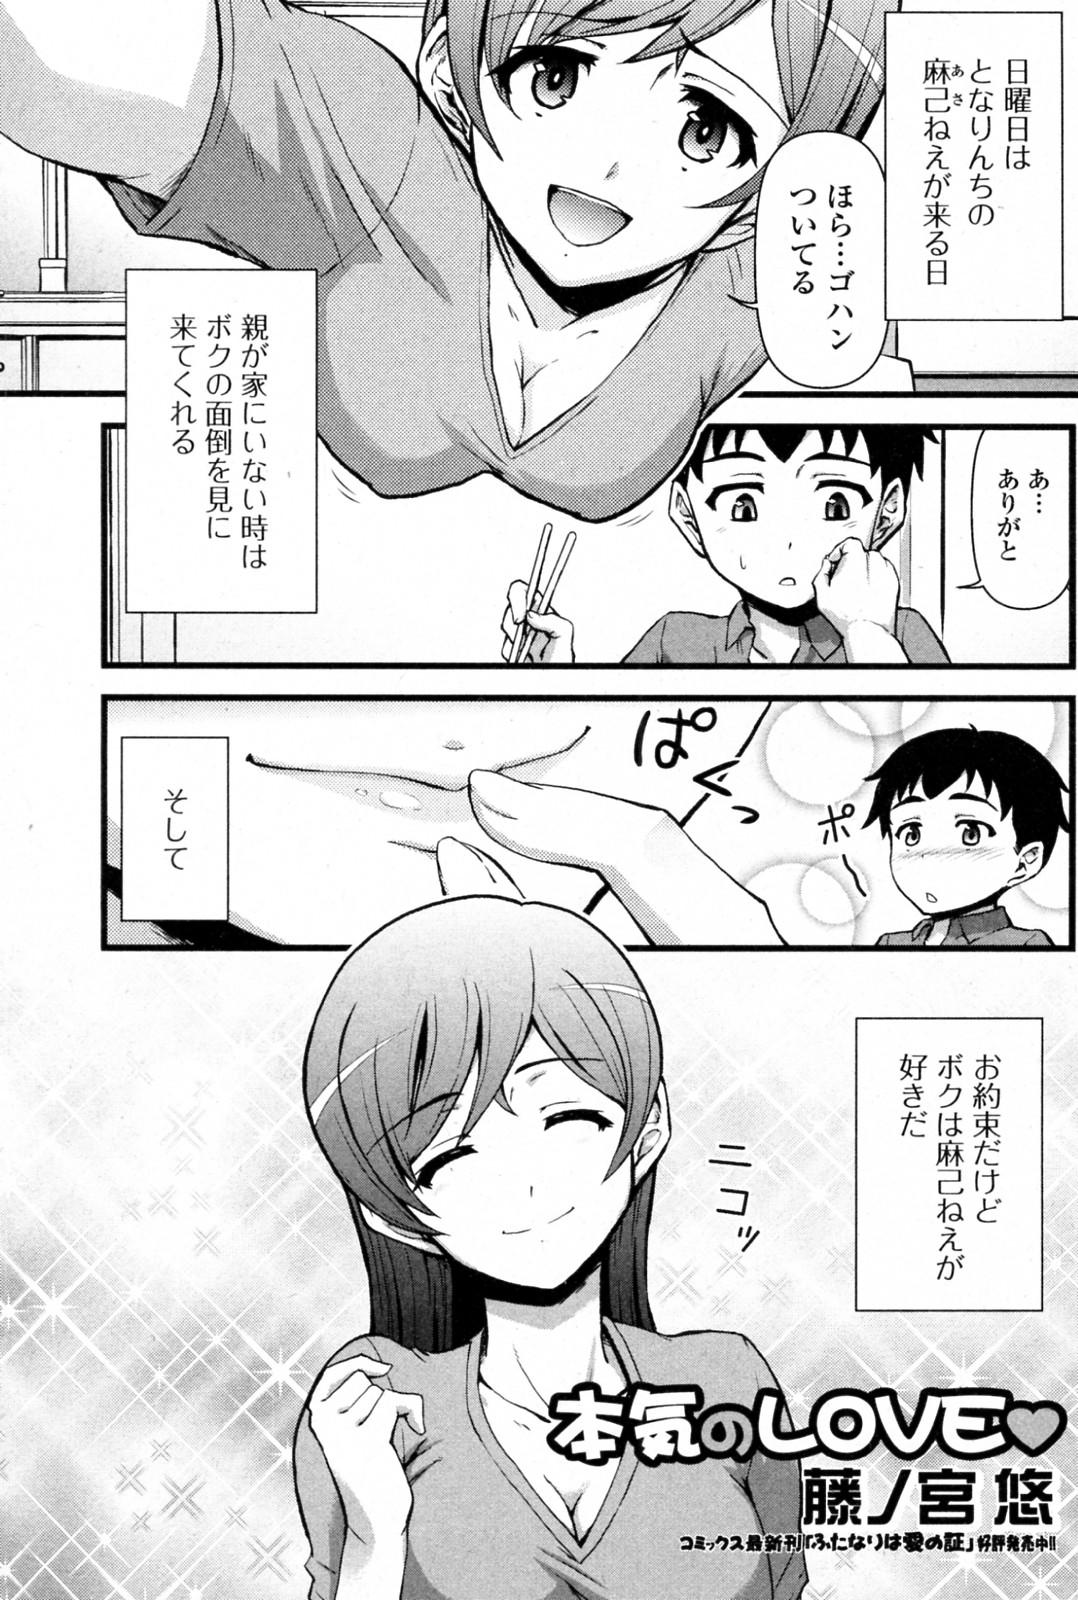 Honki no Love 0